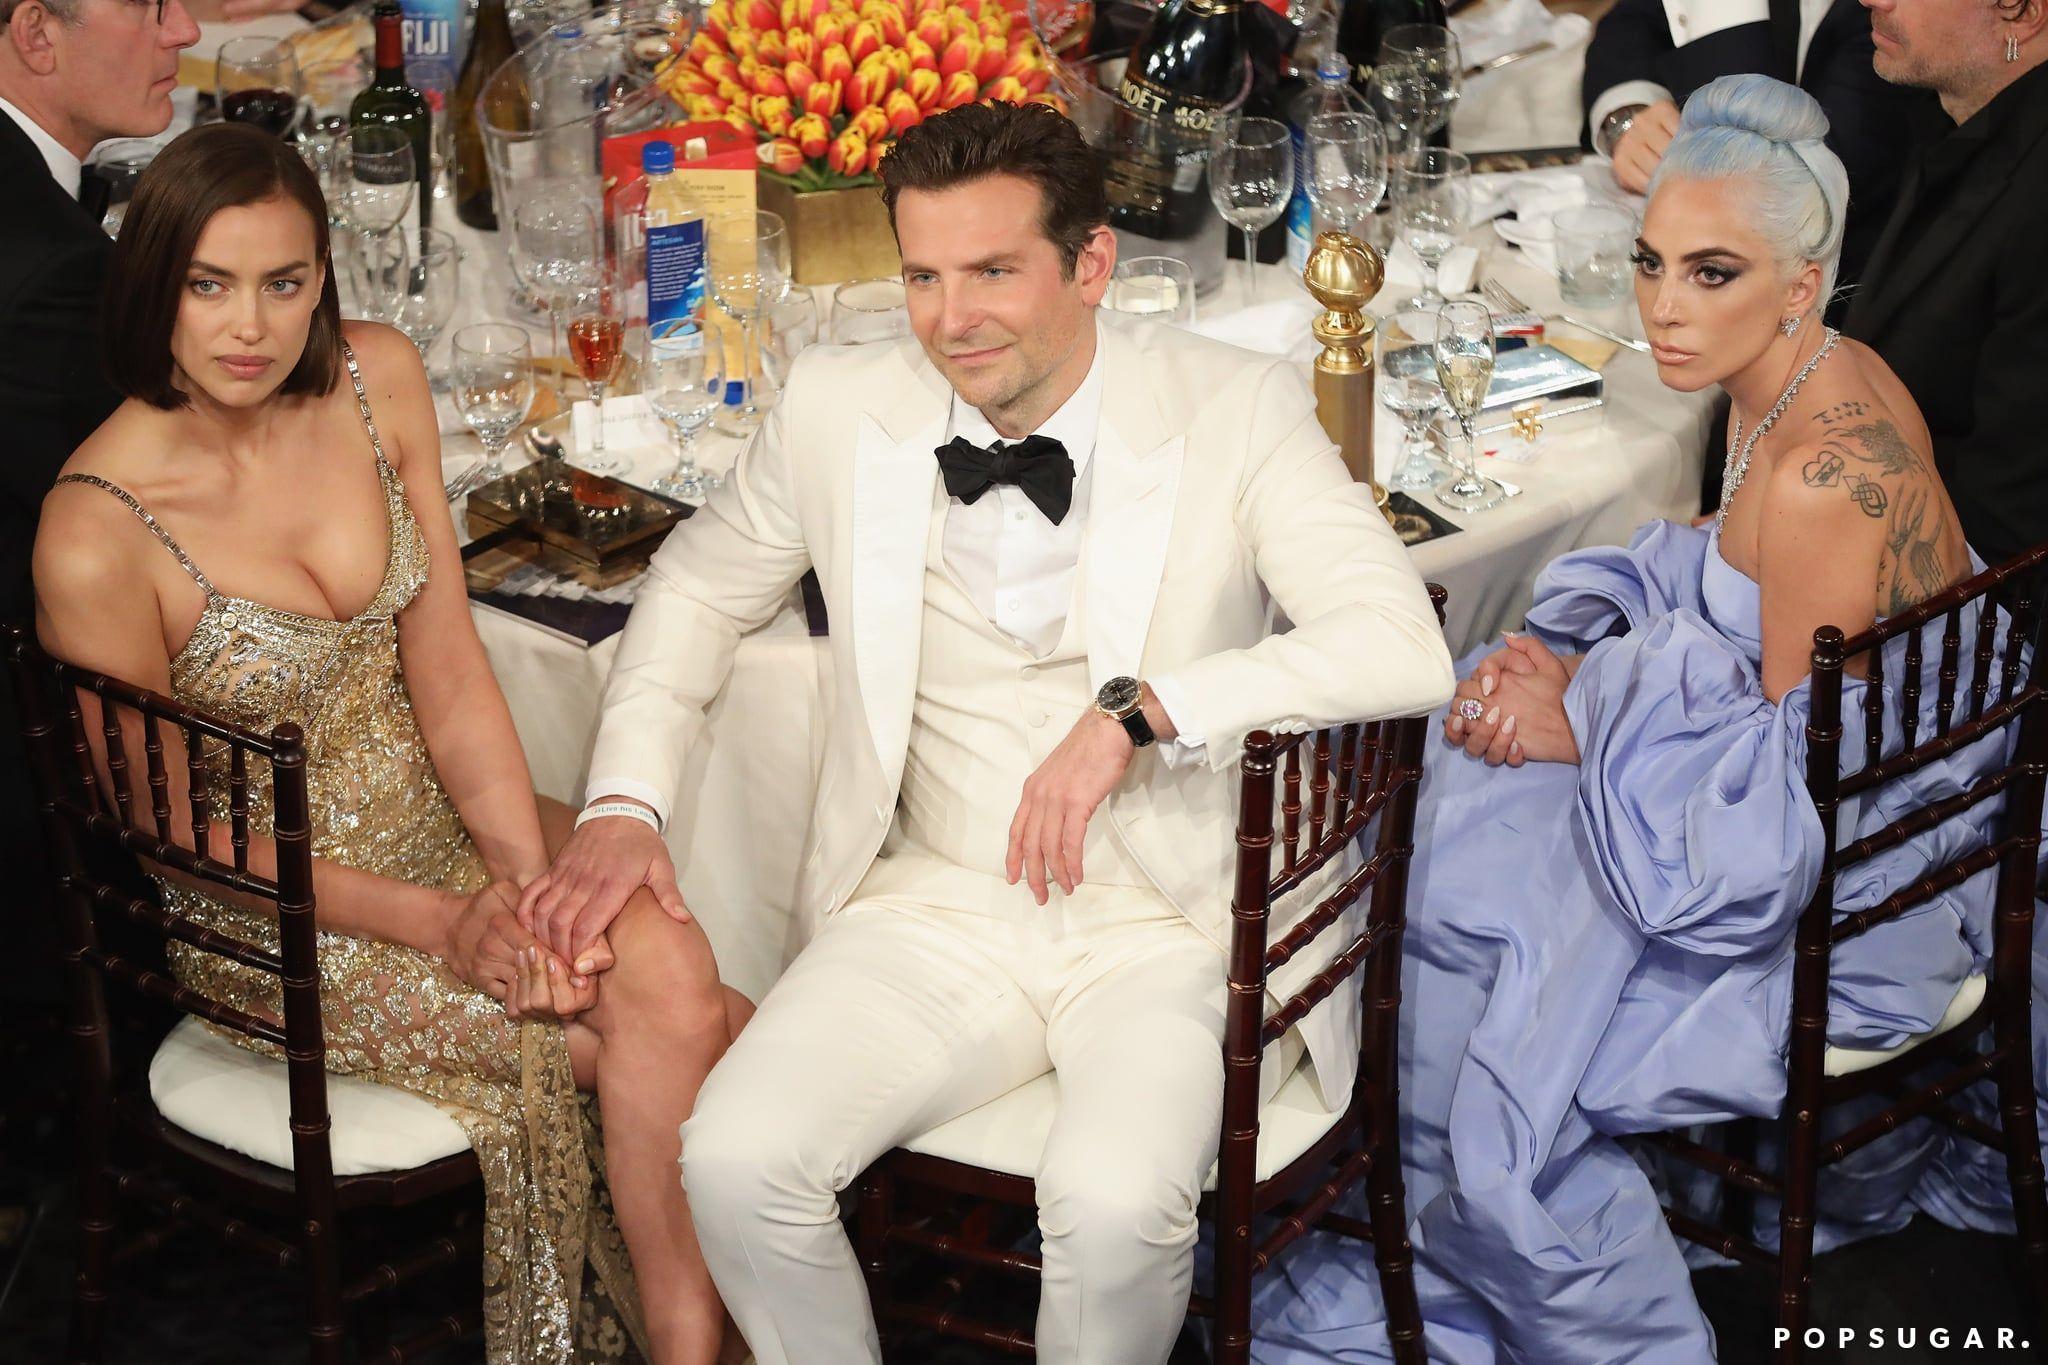 Bradley Cooper Broke Up With Irina Shayk Because of Lady Gaga? Relationship Explained